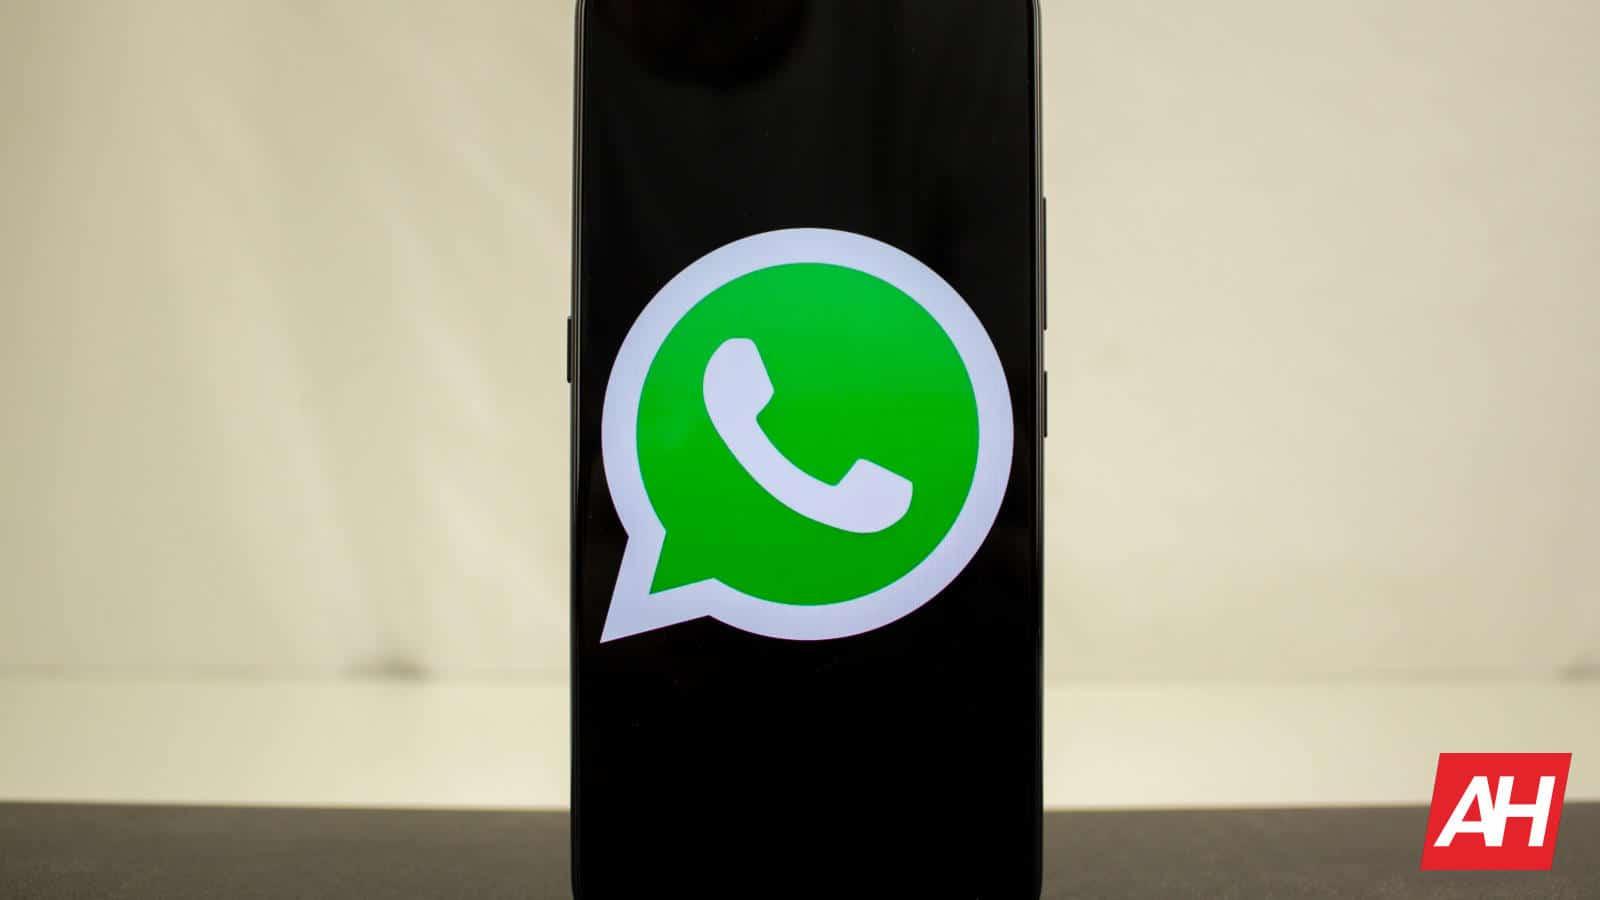 WhatsApp's new privacy policy attracts regulatory scrutiny